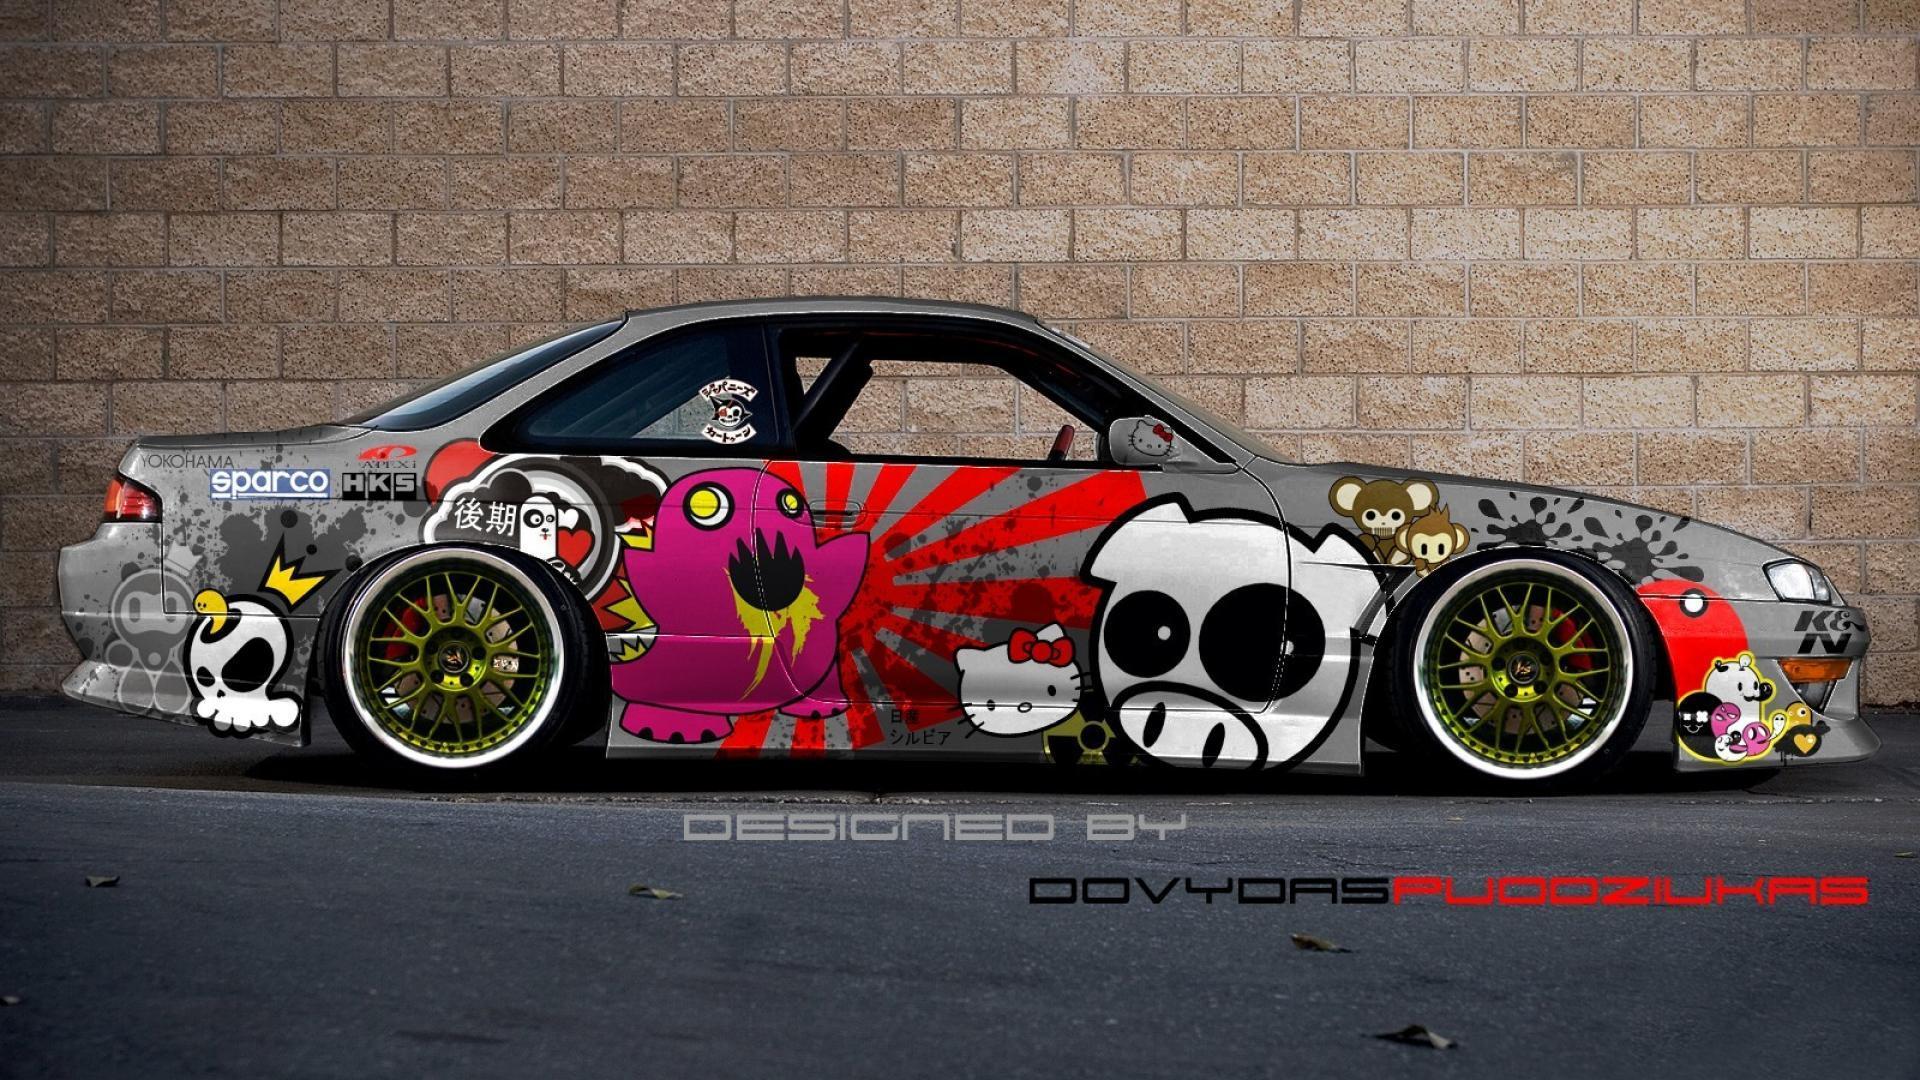 JDM Cars Wallpapers - Wallpaper Cave